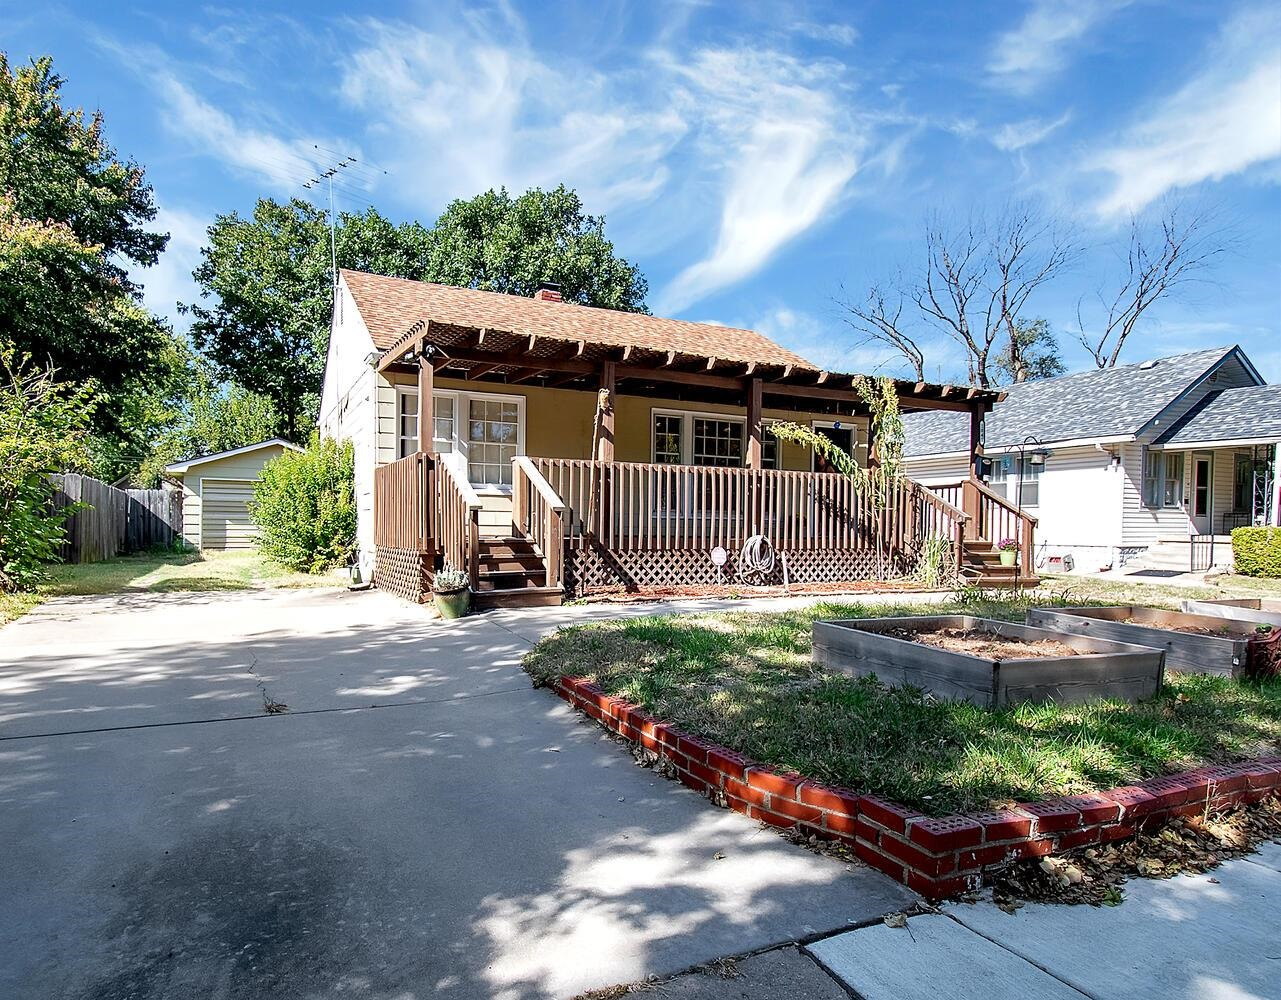 Fantastic North Riverside home for sale.  Featuring a huge front deck, beautiful hardwood floors, ba